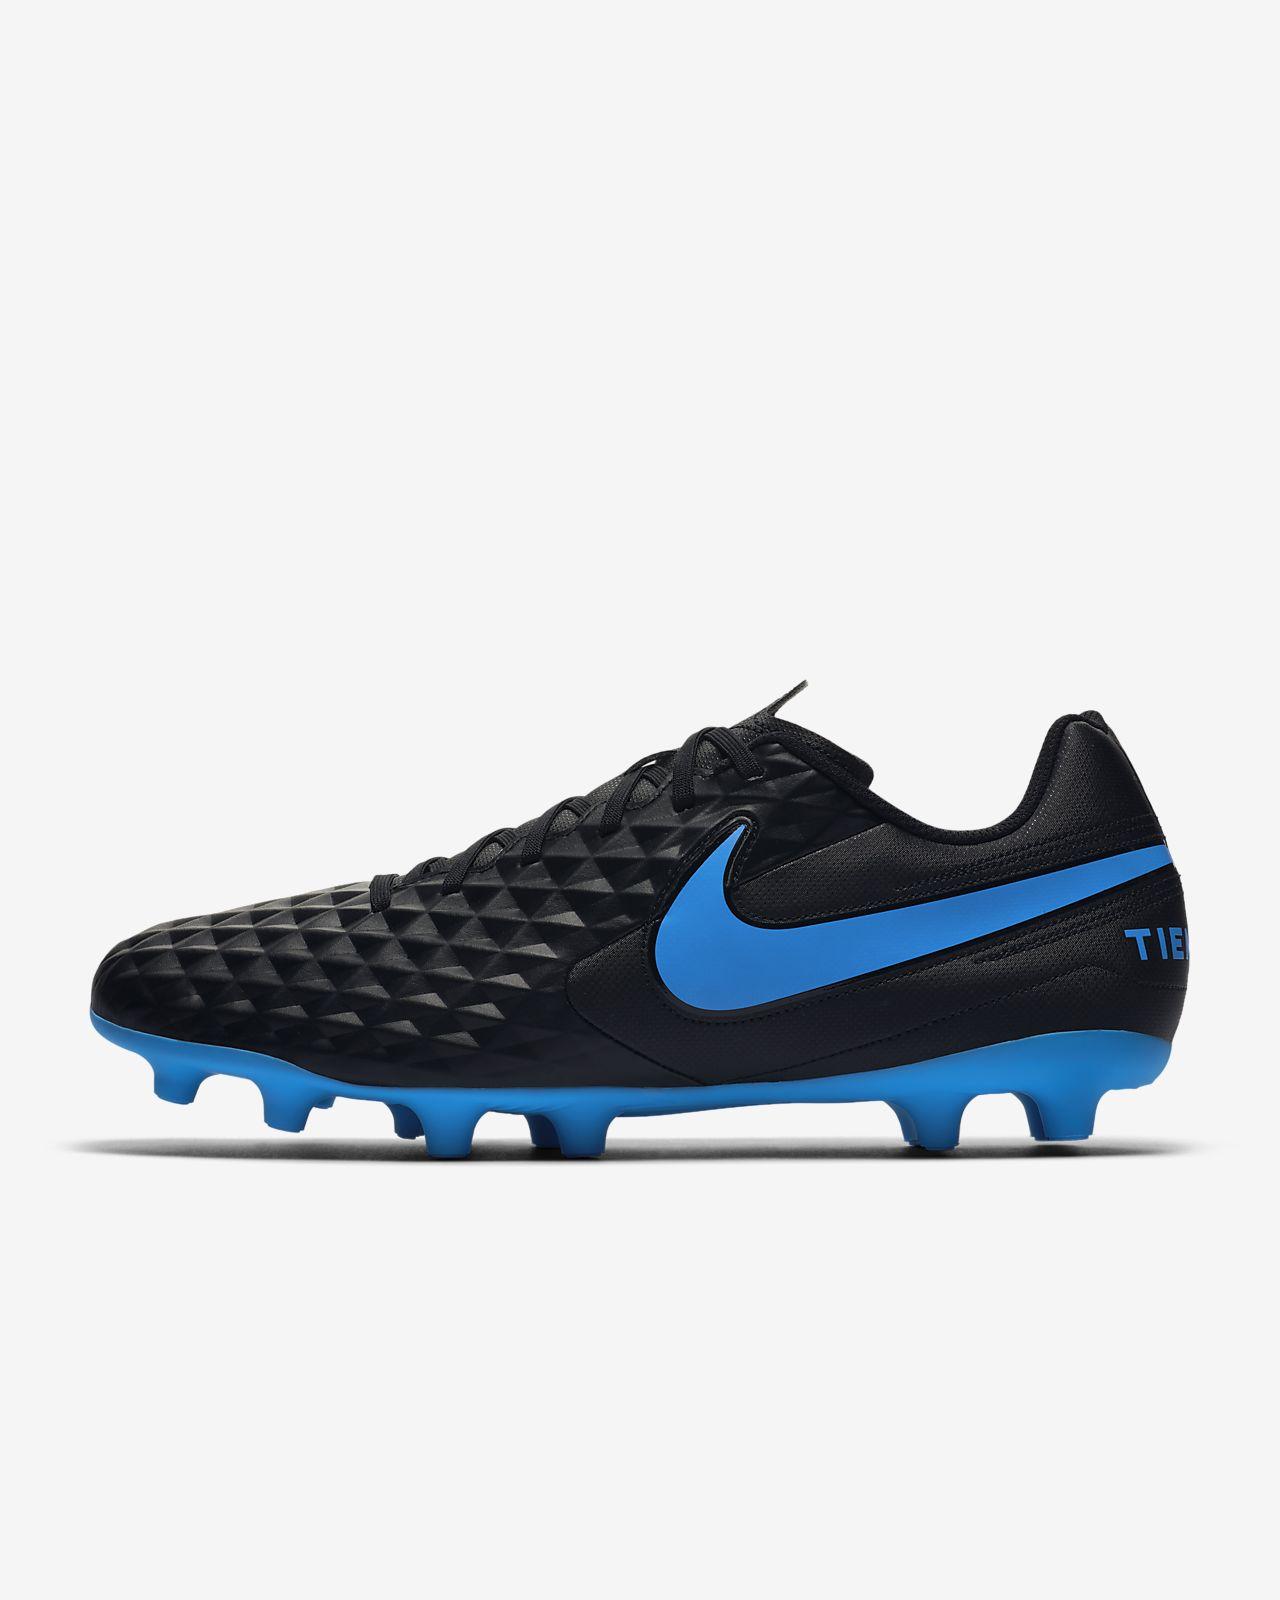 Chaussure de football multi-surfaces à crampons Nike Tiempo Legend 8 Club MG